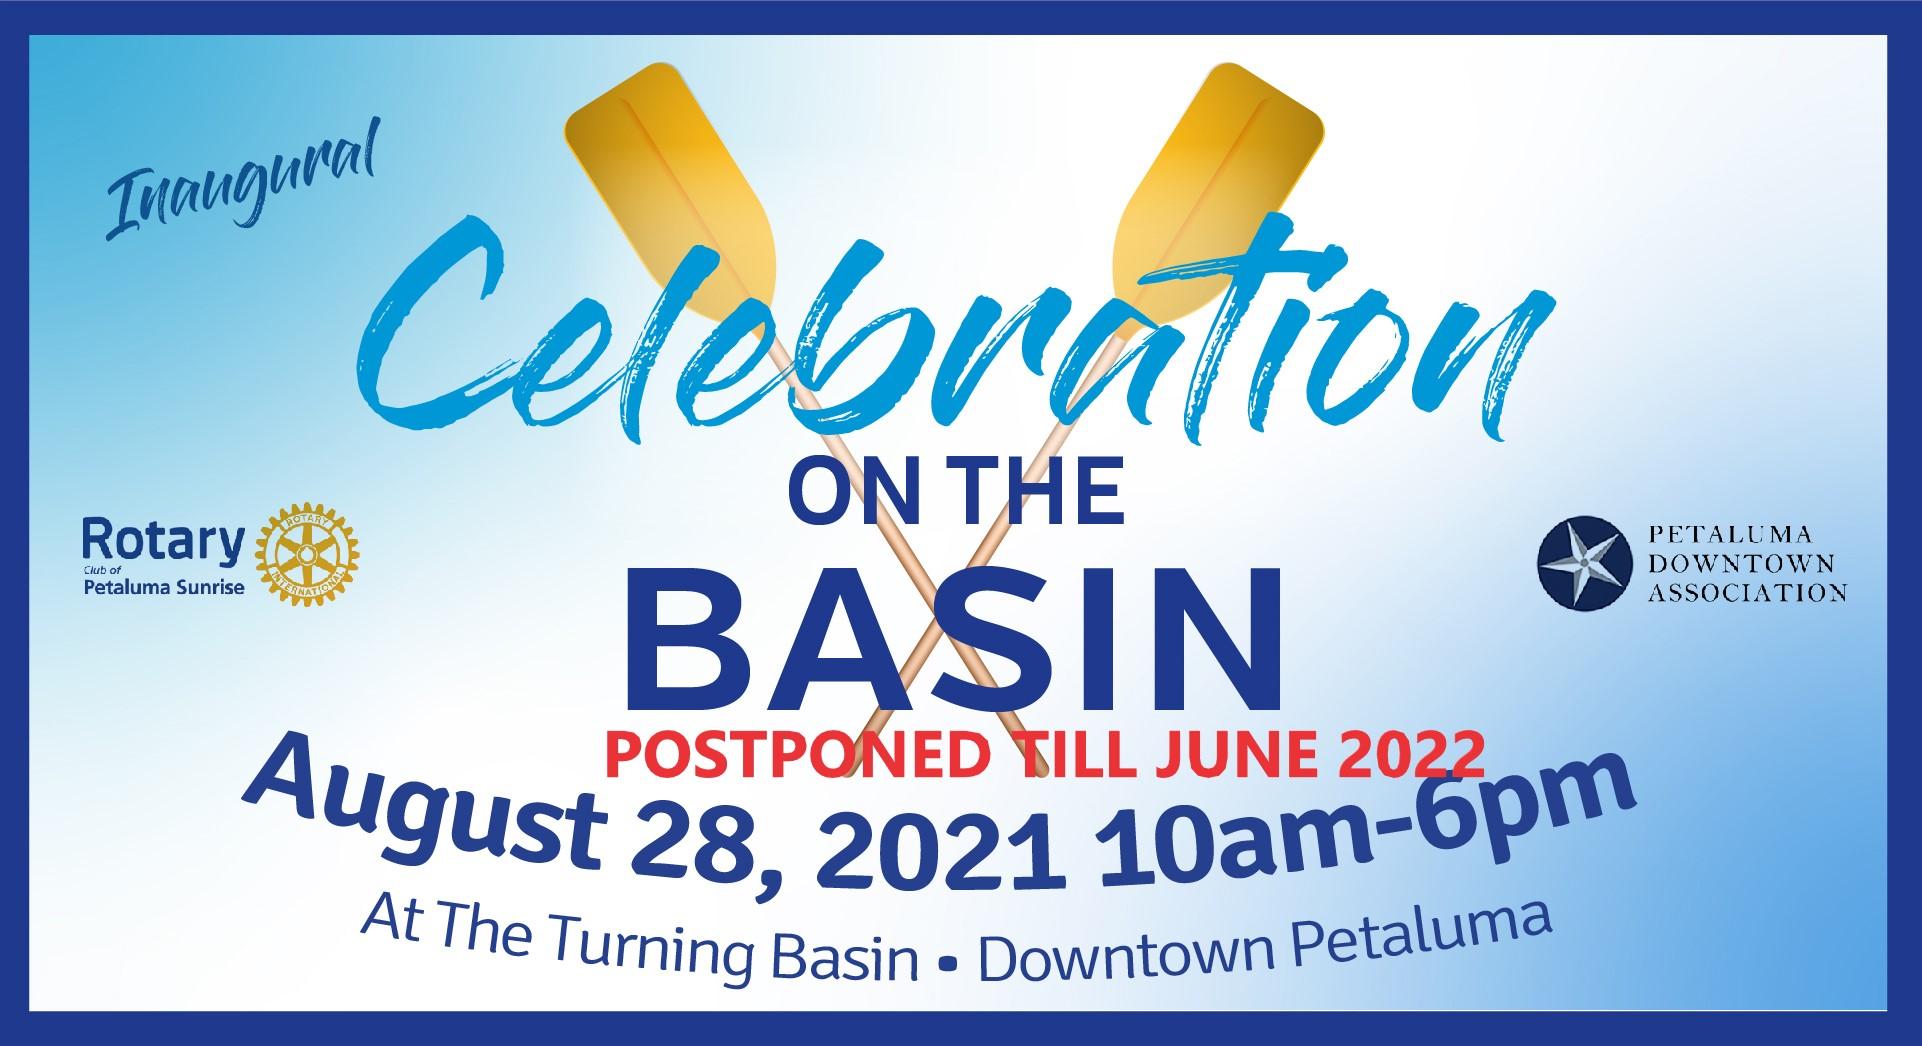 POSTPONED Celebration on the  Basin  Saturday 8/28/2021